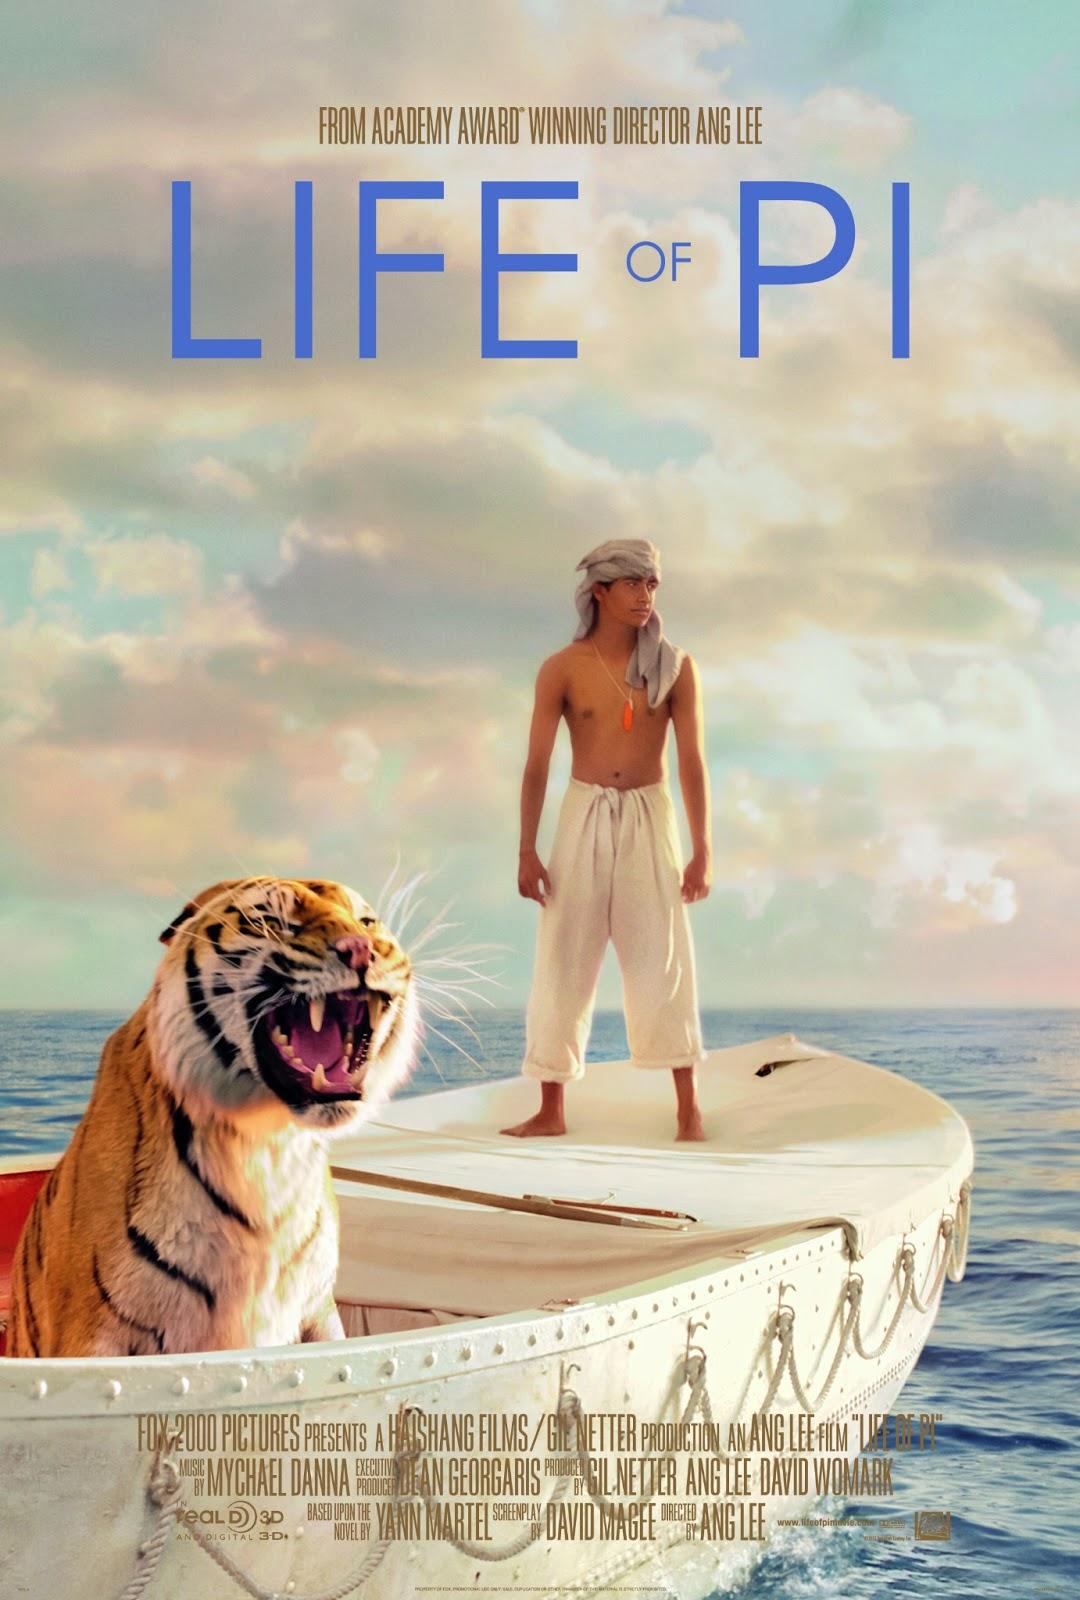 http://1.bp.blogspot.com/-BTEuLGFaHxw/URhURgz67wI/AAAAAAAAIPQ/LG-it4UcwxI/s1600/life-of-pi-LifeOfPi_VerA_Poster_rgb.jpg